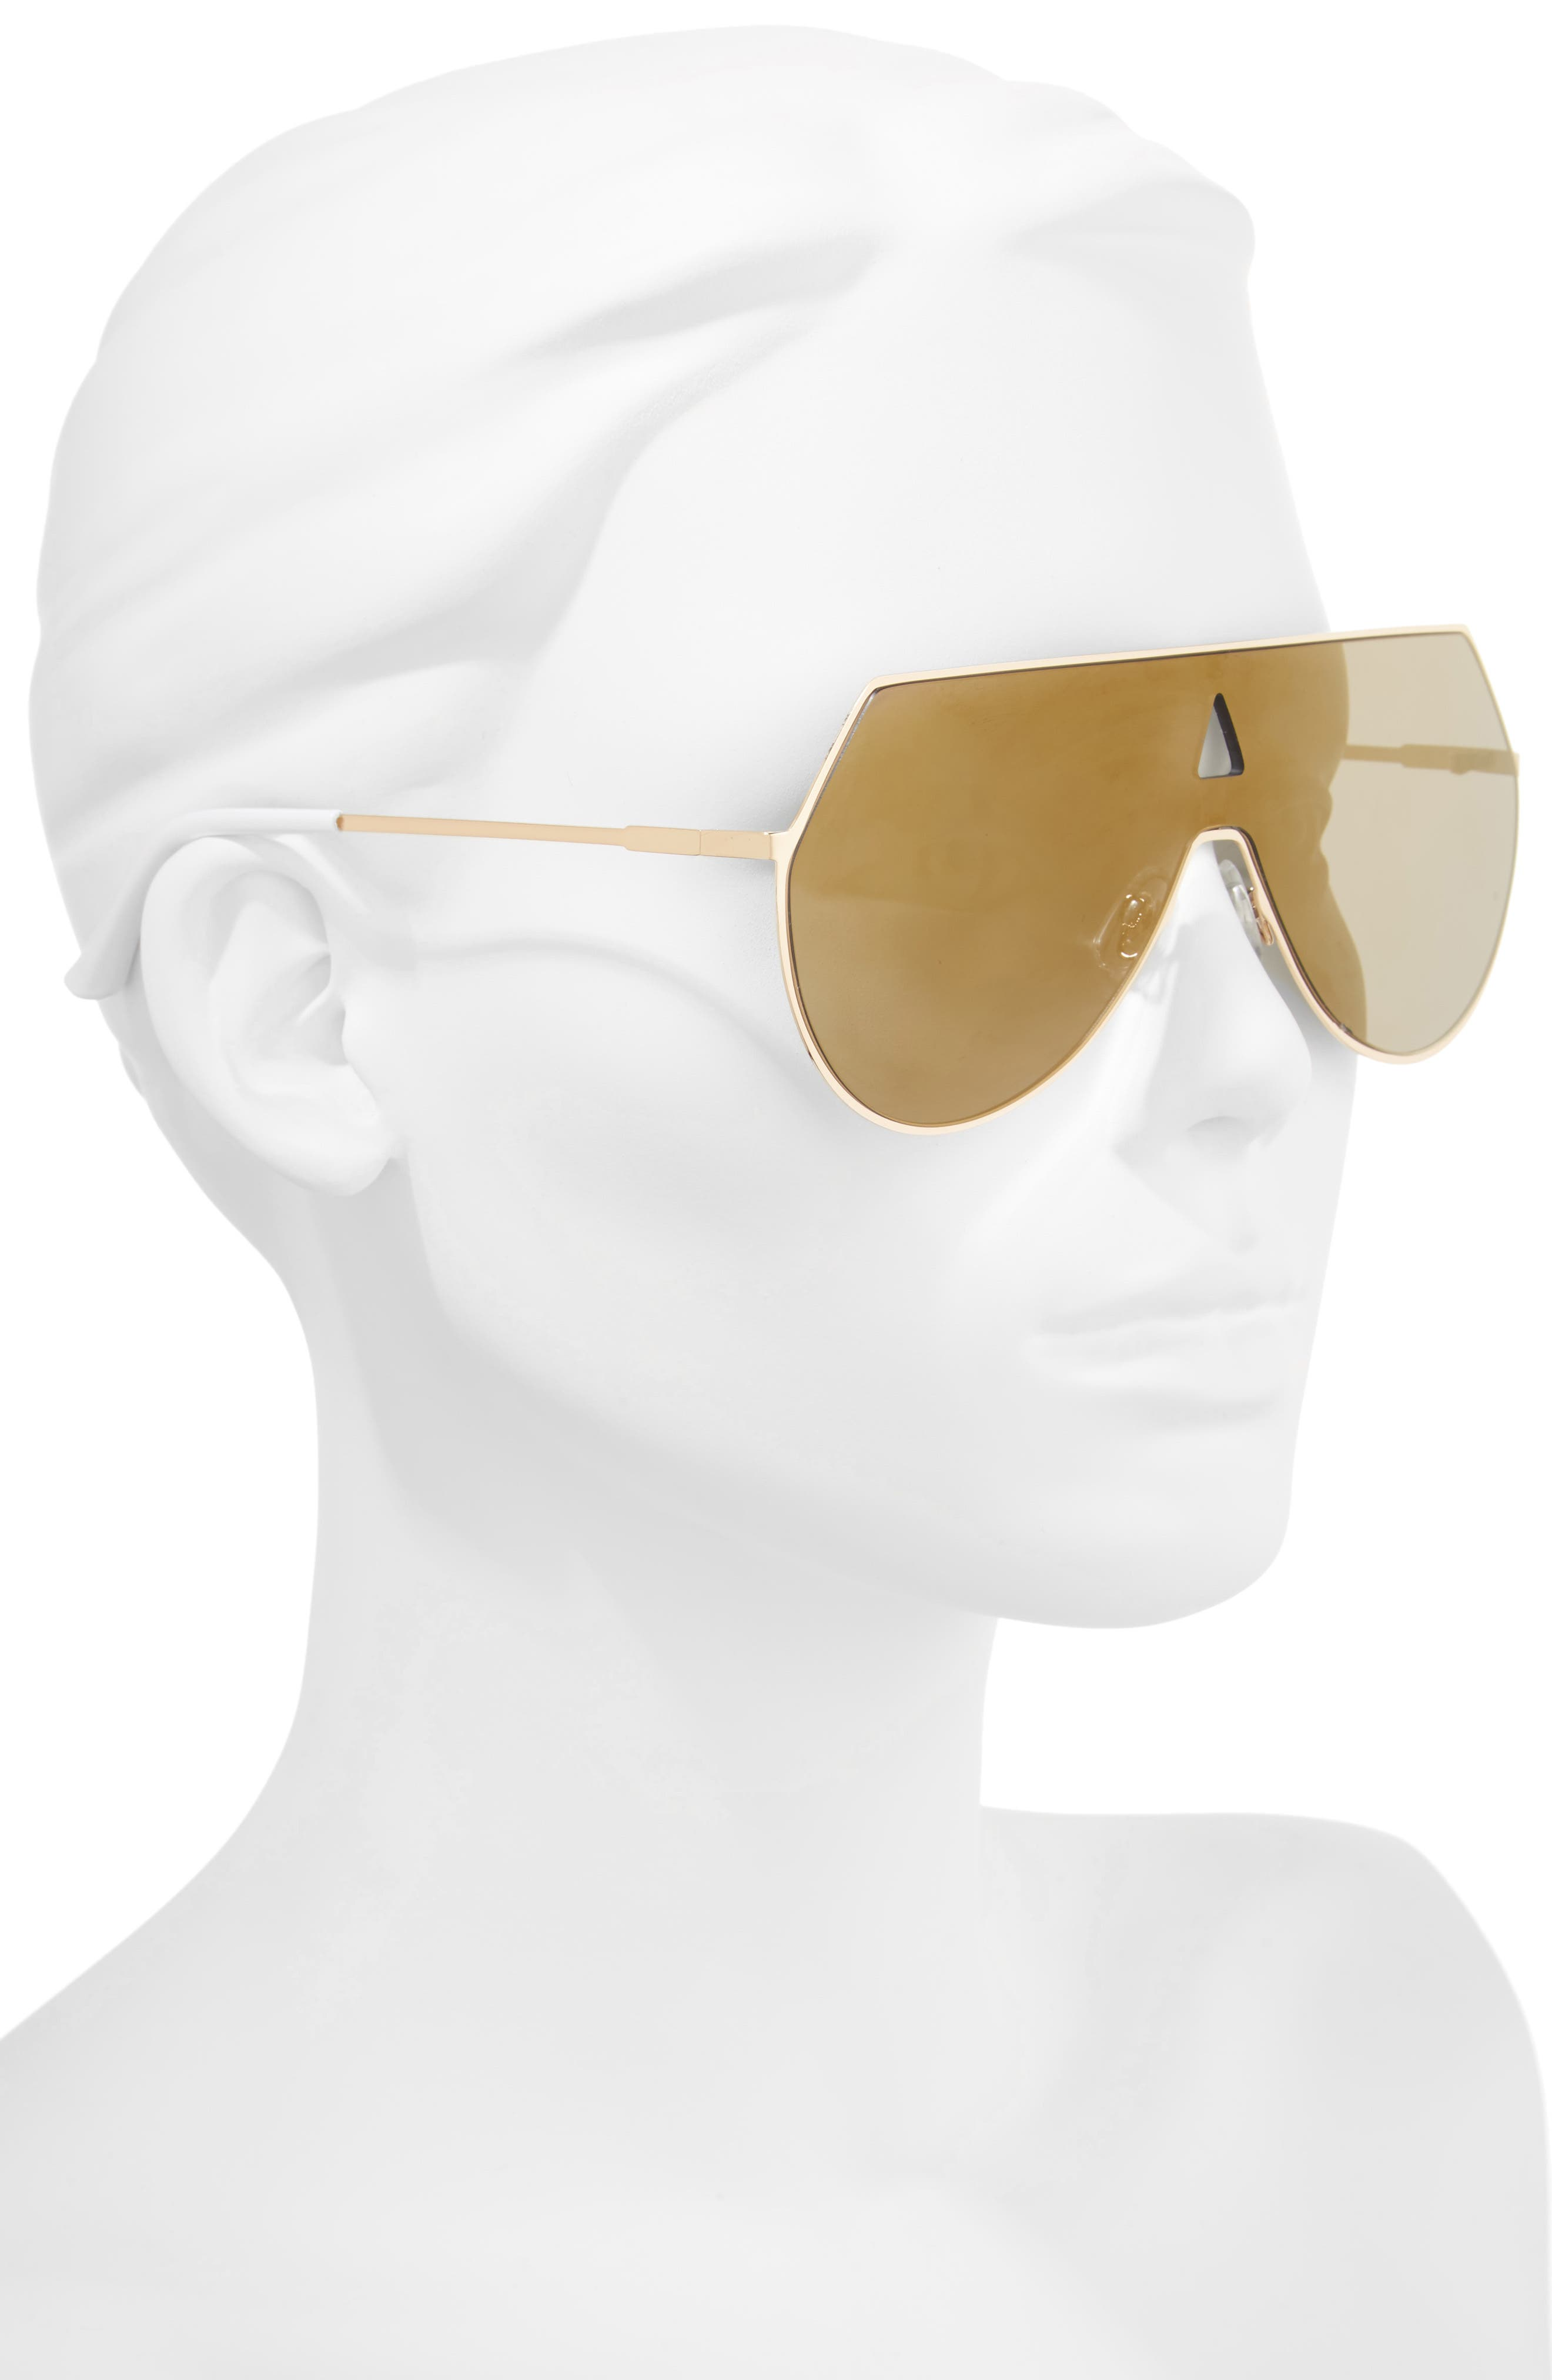 60mm Flat Lens Aviator Sunglasses,                             Alternate thumbnail 2, color,